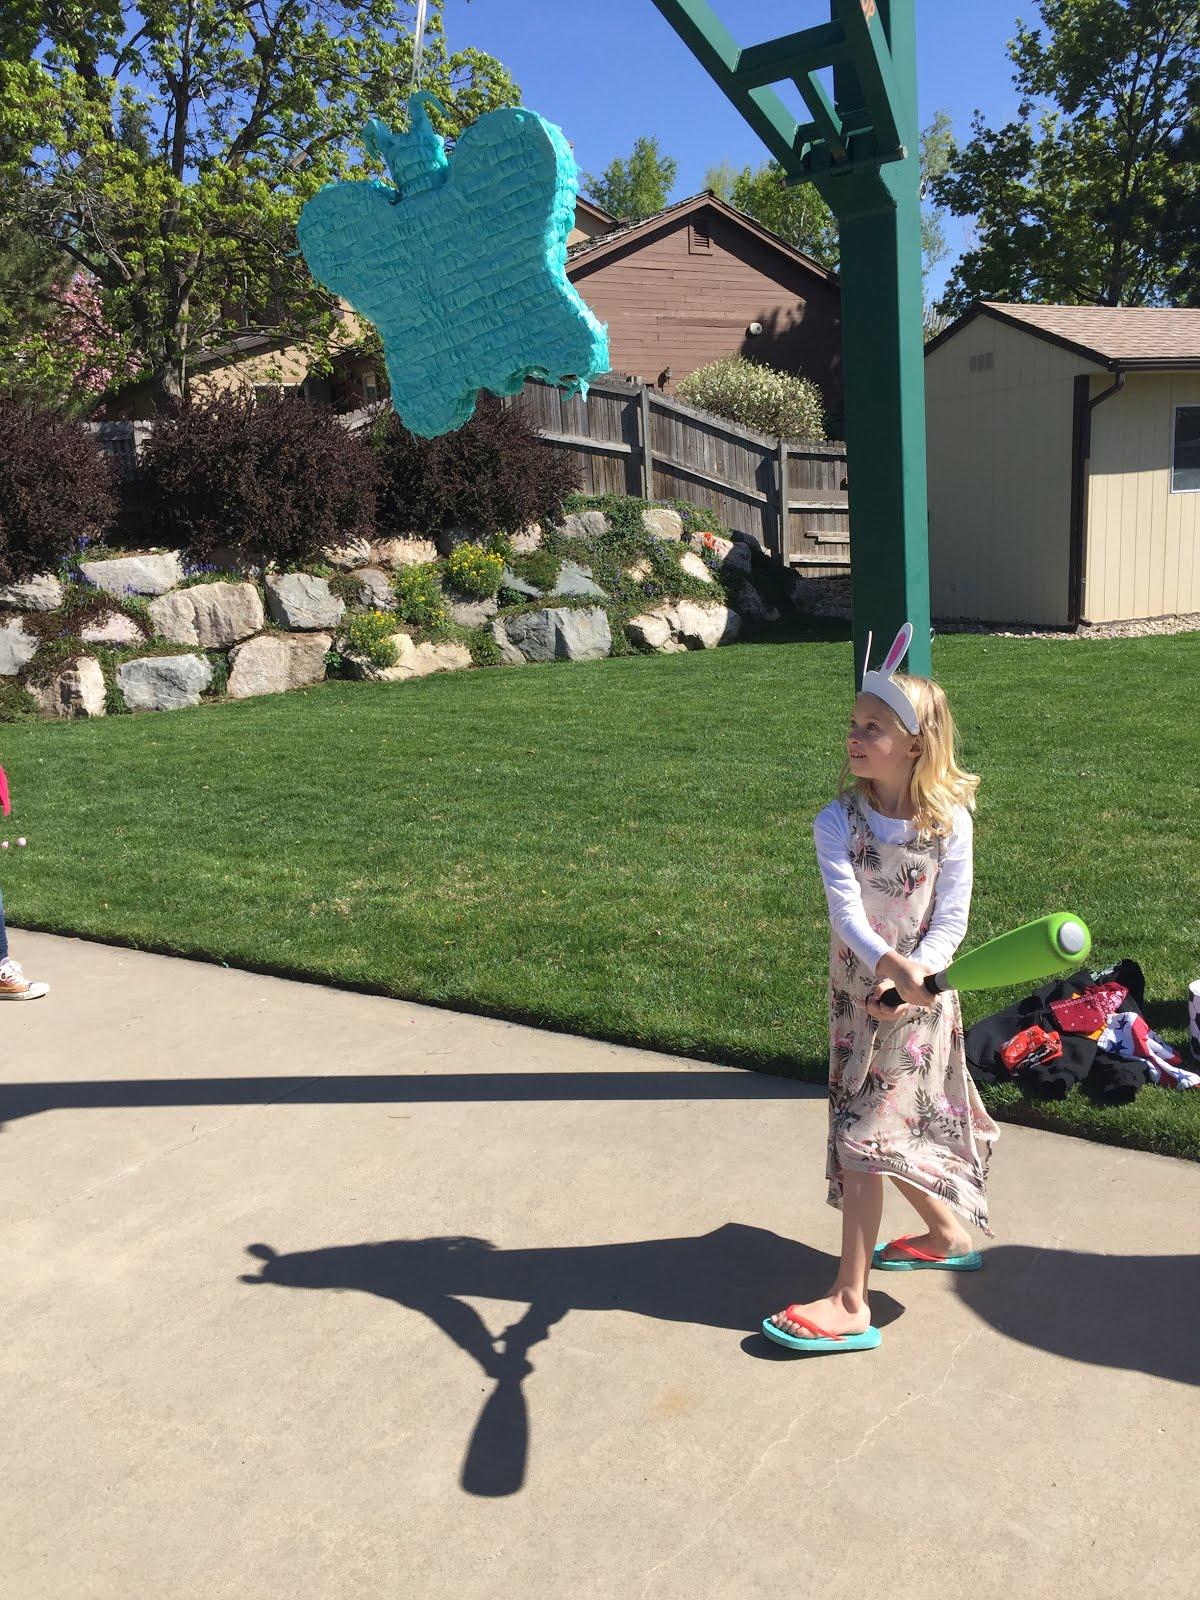 Easter Pinhata Dois